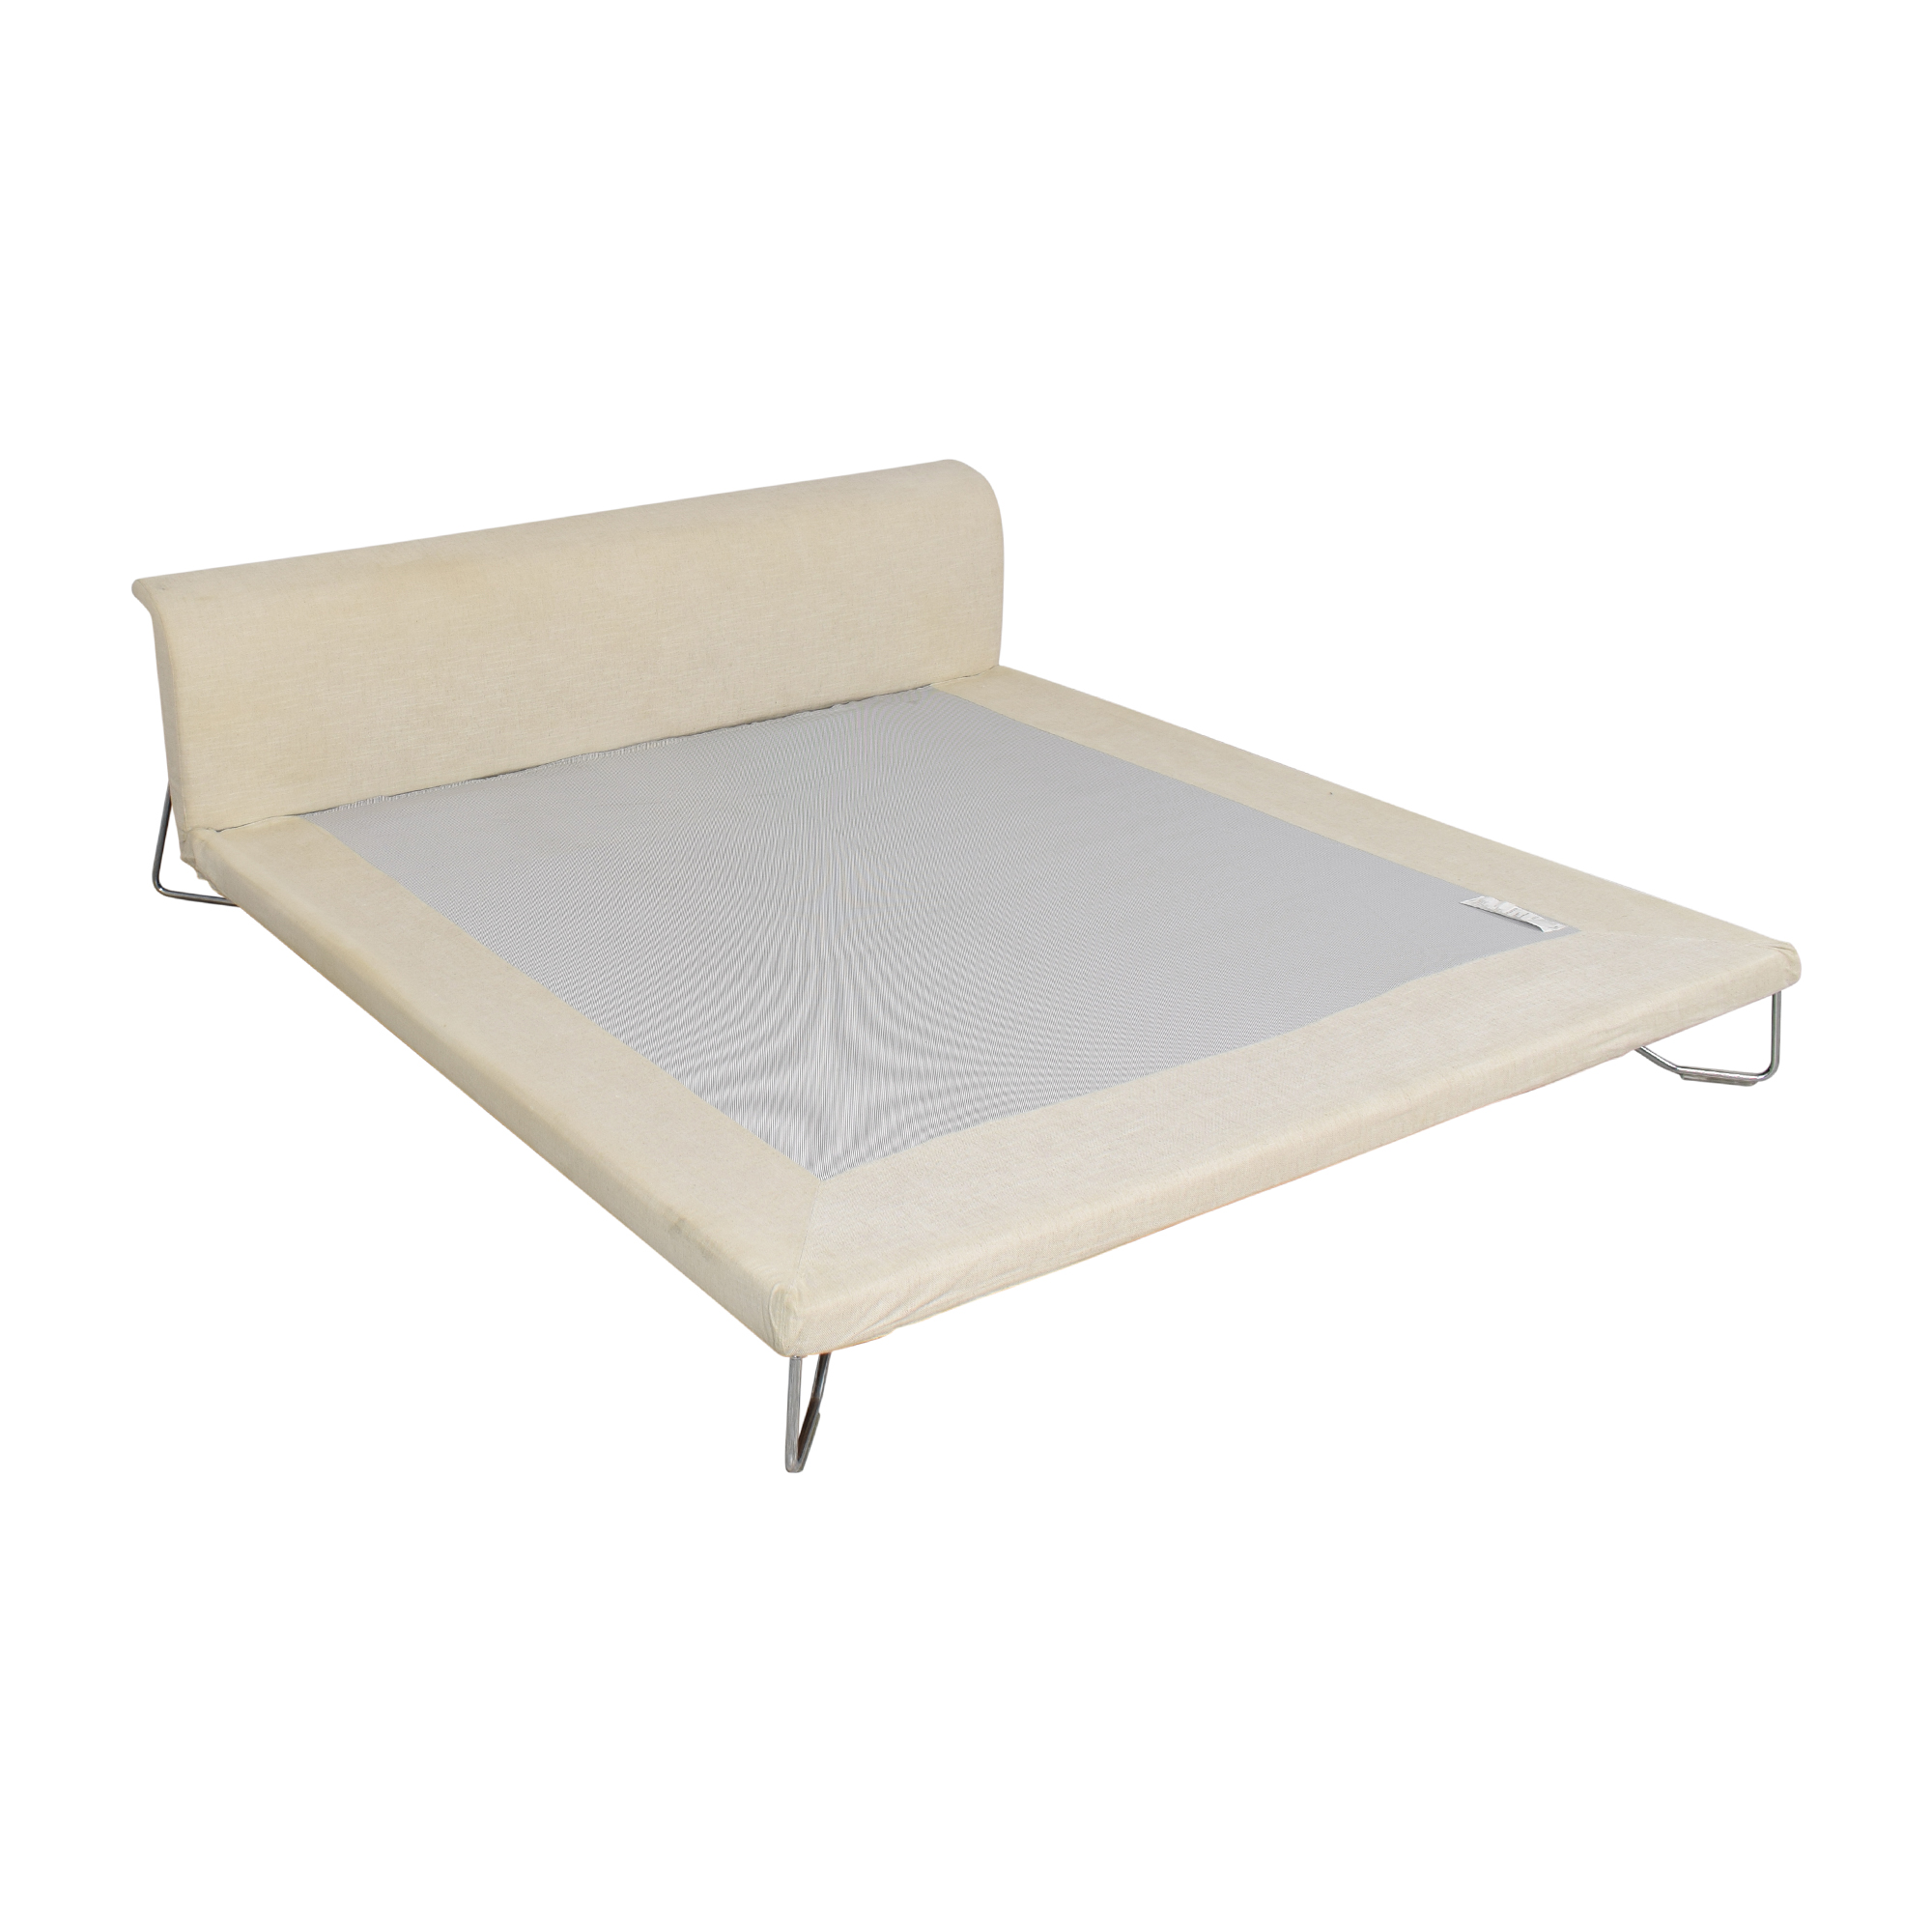 Tacchini Tacchini Barry Modern King Bed nyc